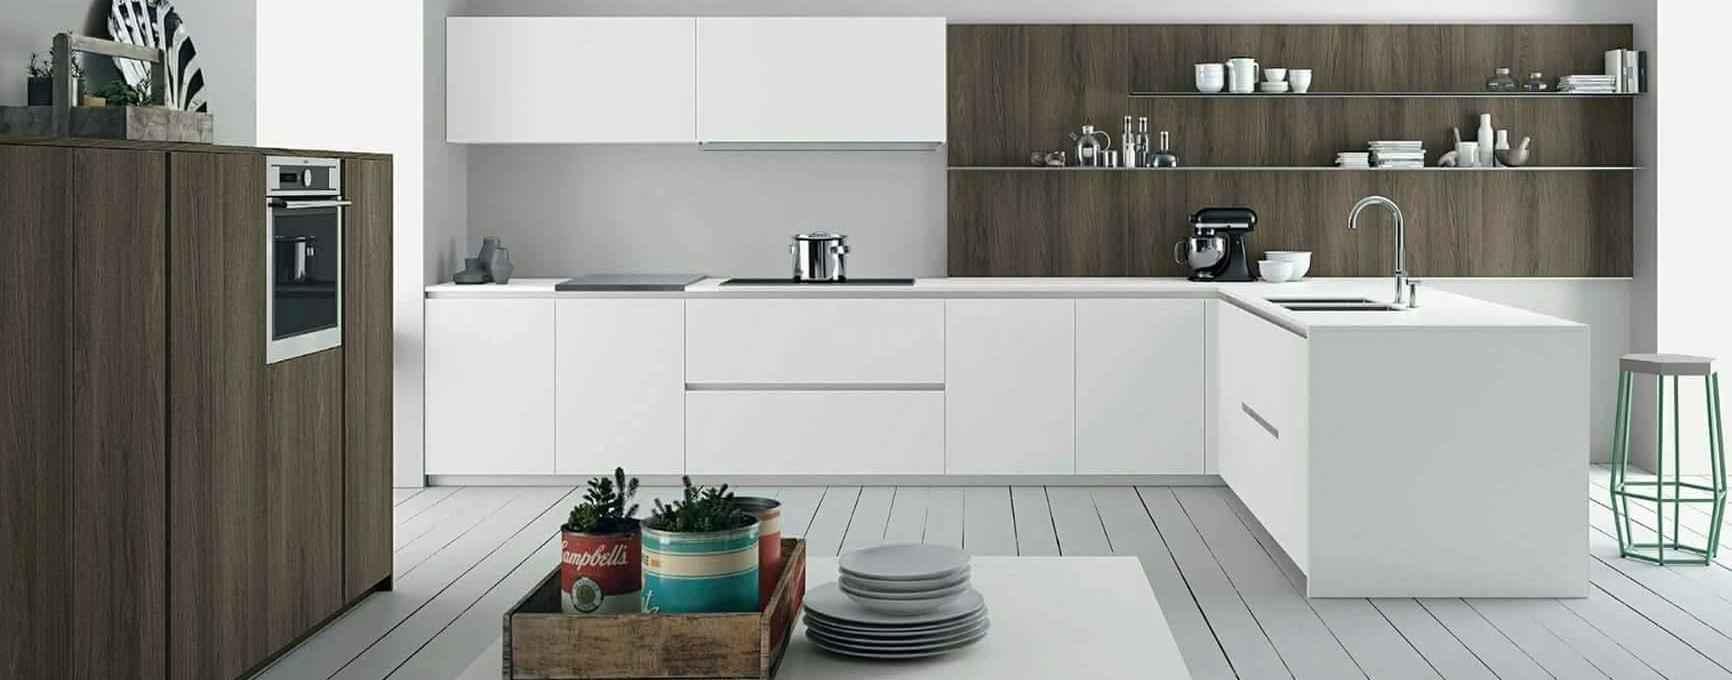 Arco arte en cocinas tenerife tu cocina completamente for Cocinas xey en tenerife